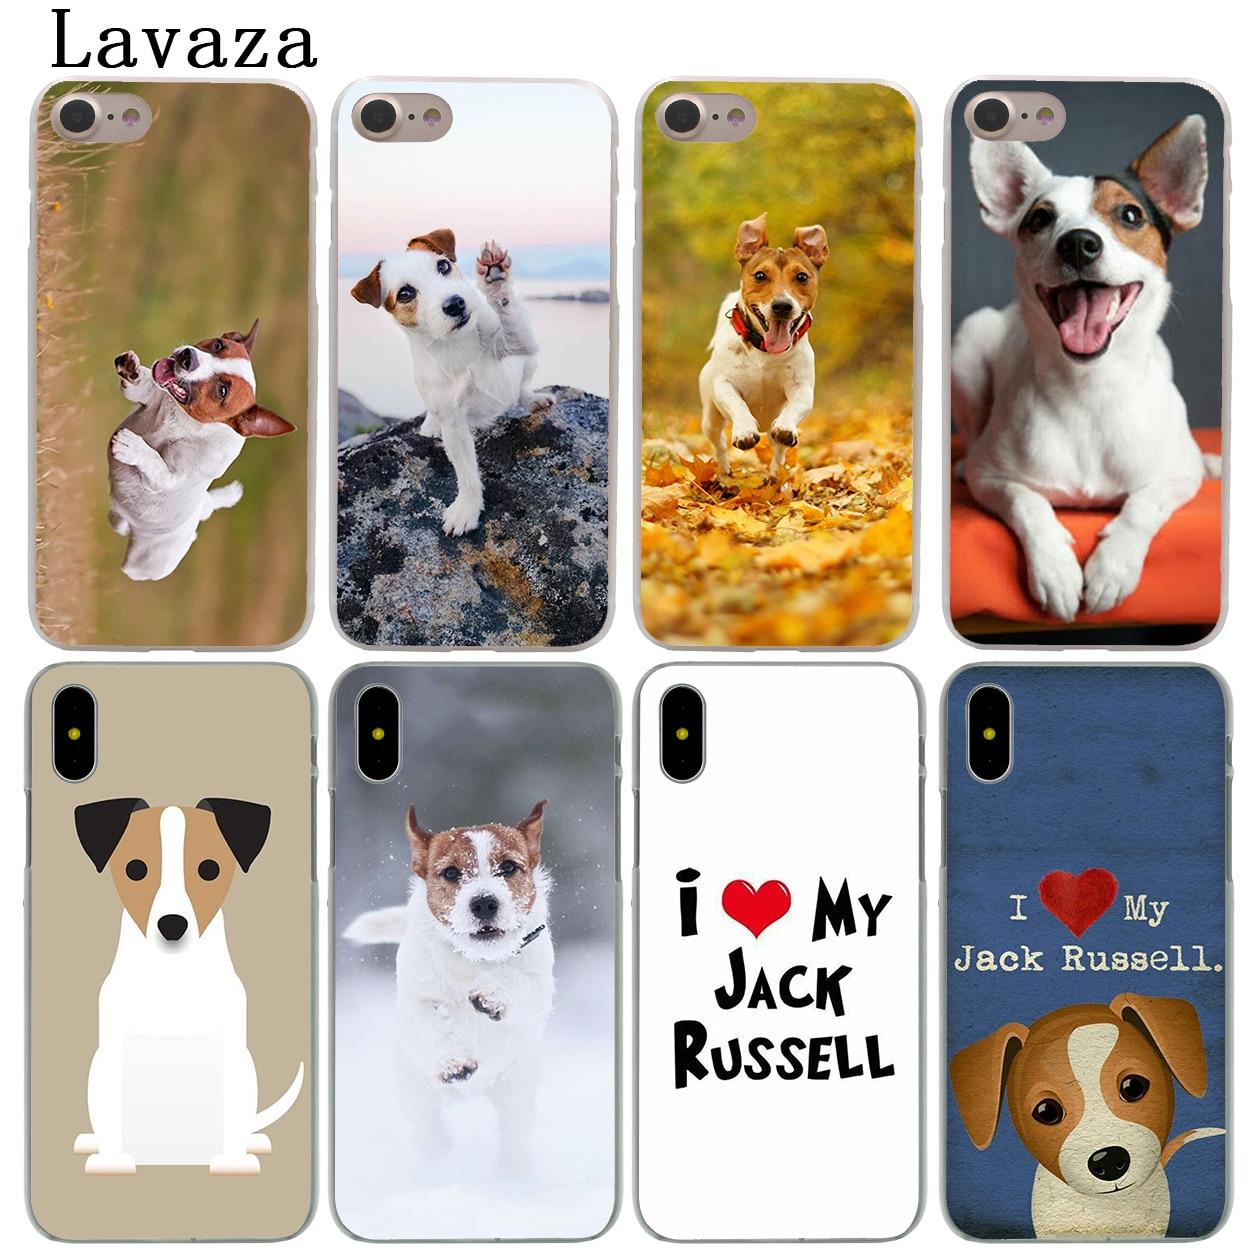 Твердый чехол для телефона Lavaza Jack Russell Terrier Dog Для iPhone XR X 11 Pro XS Max 7 8 6 6S 5 5S SE 4S 4 10